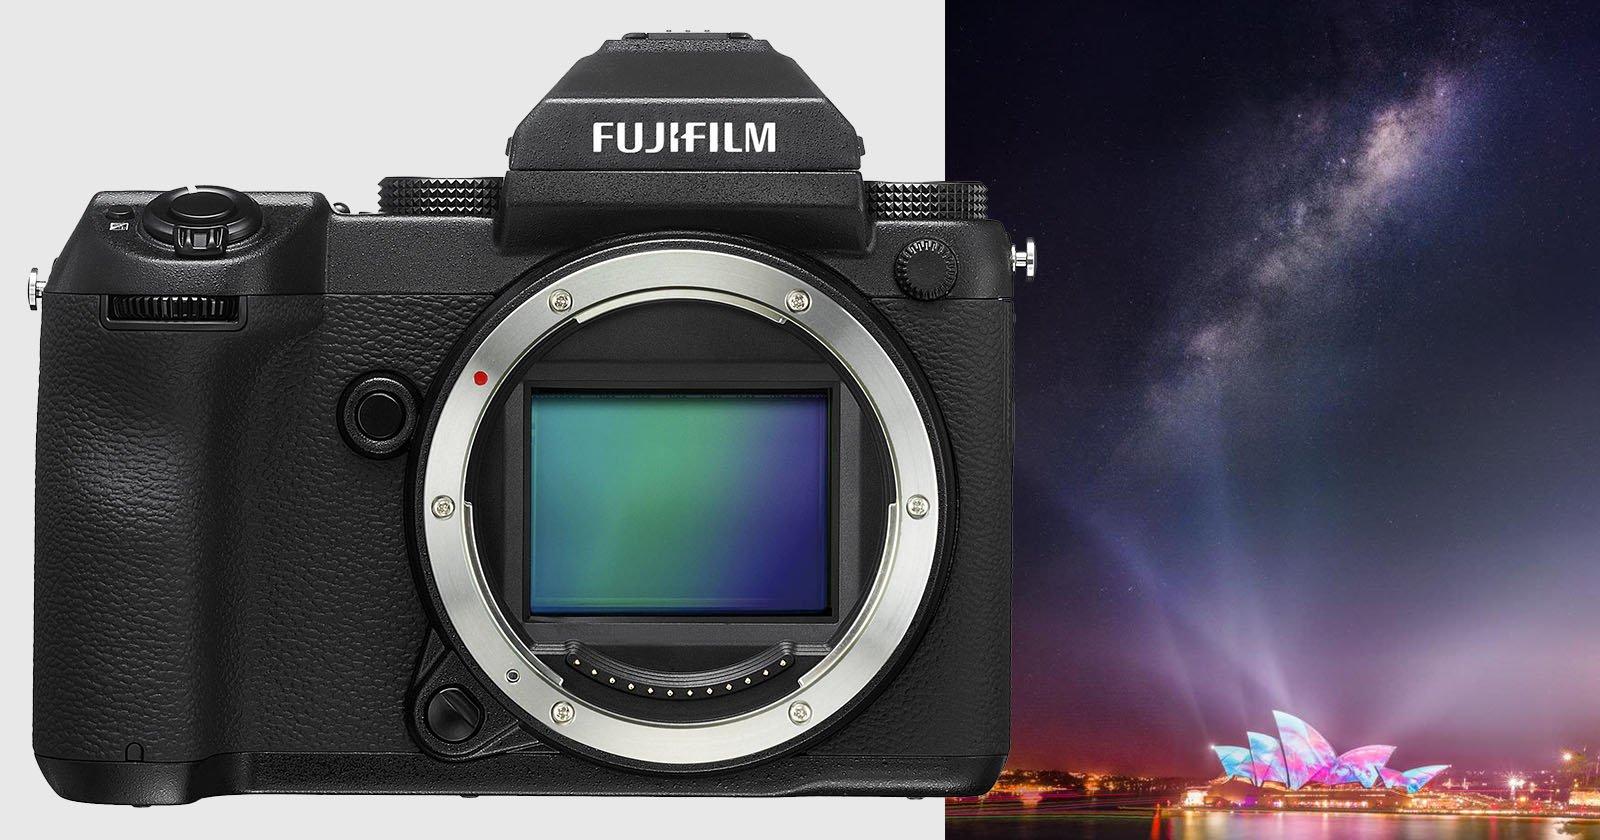 The Fujifilm GFX 50S's High ISO Quality is Insane